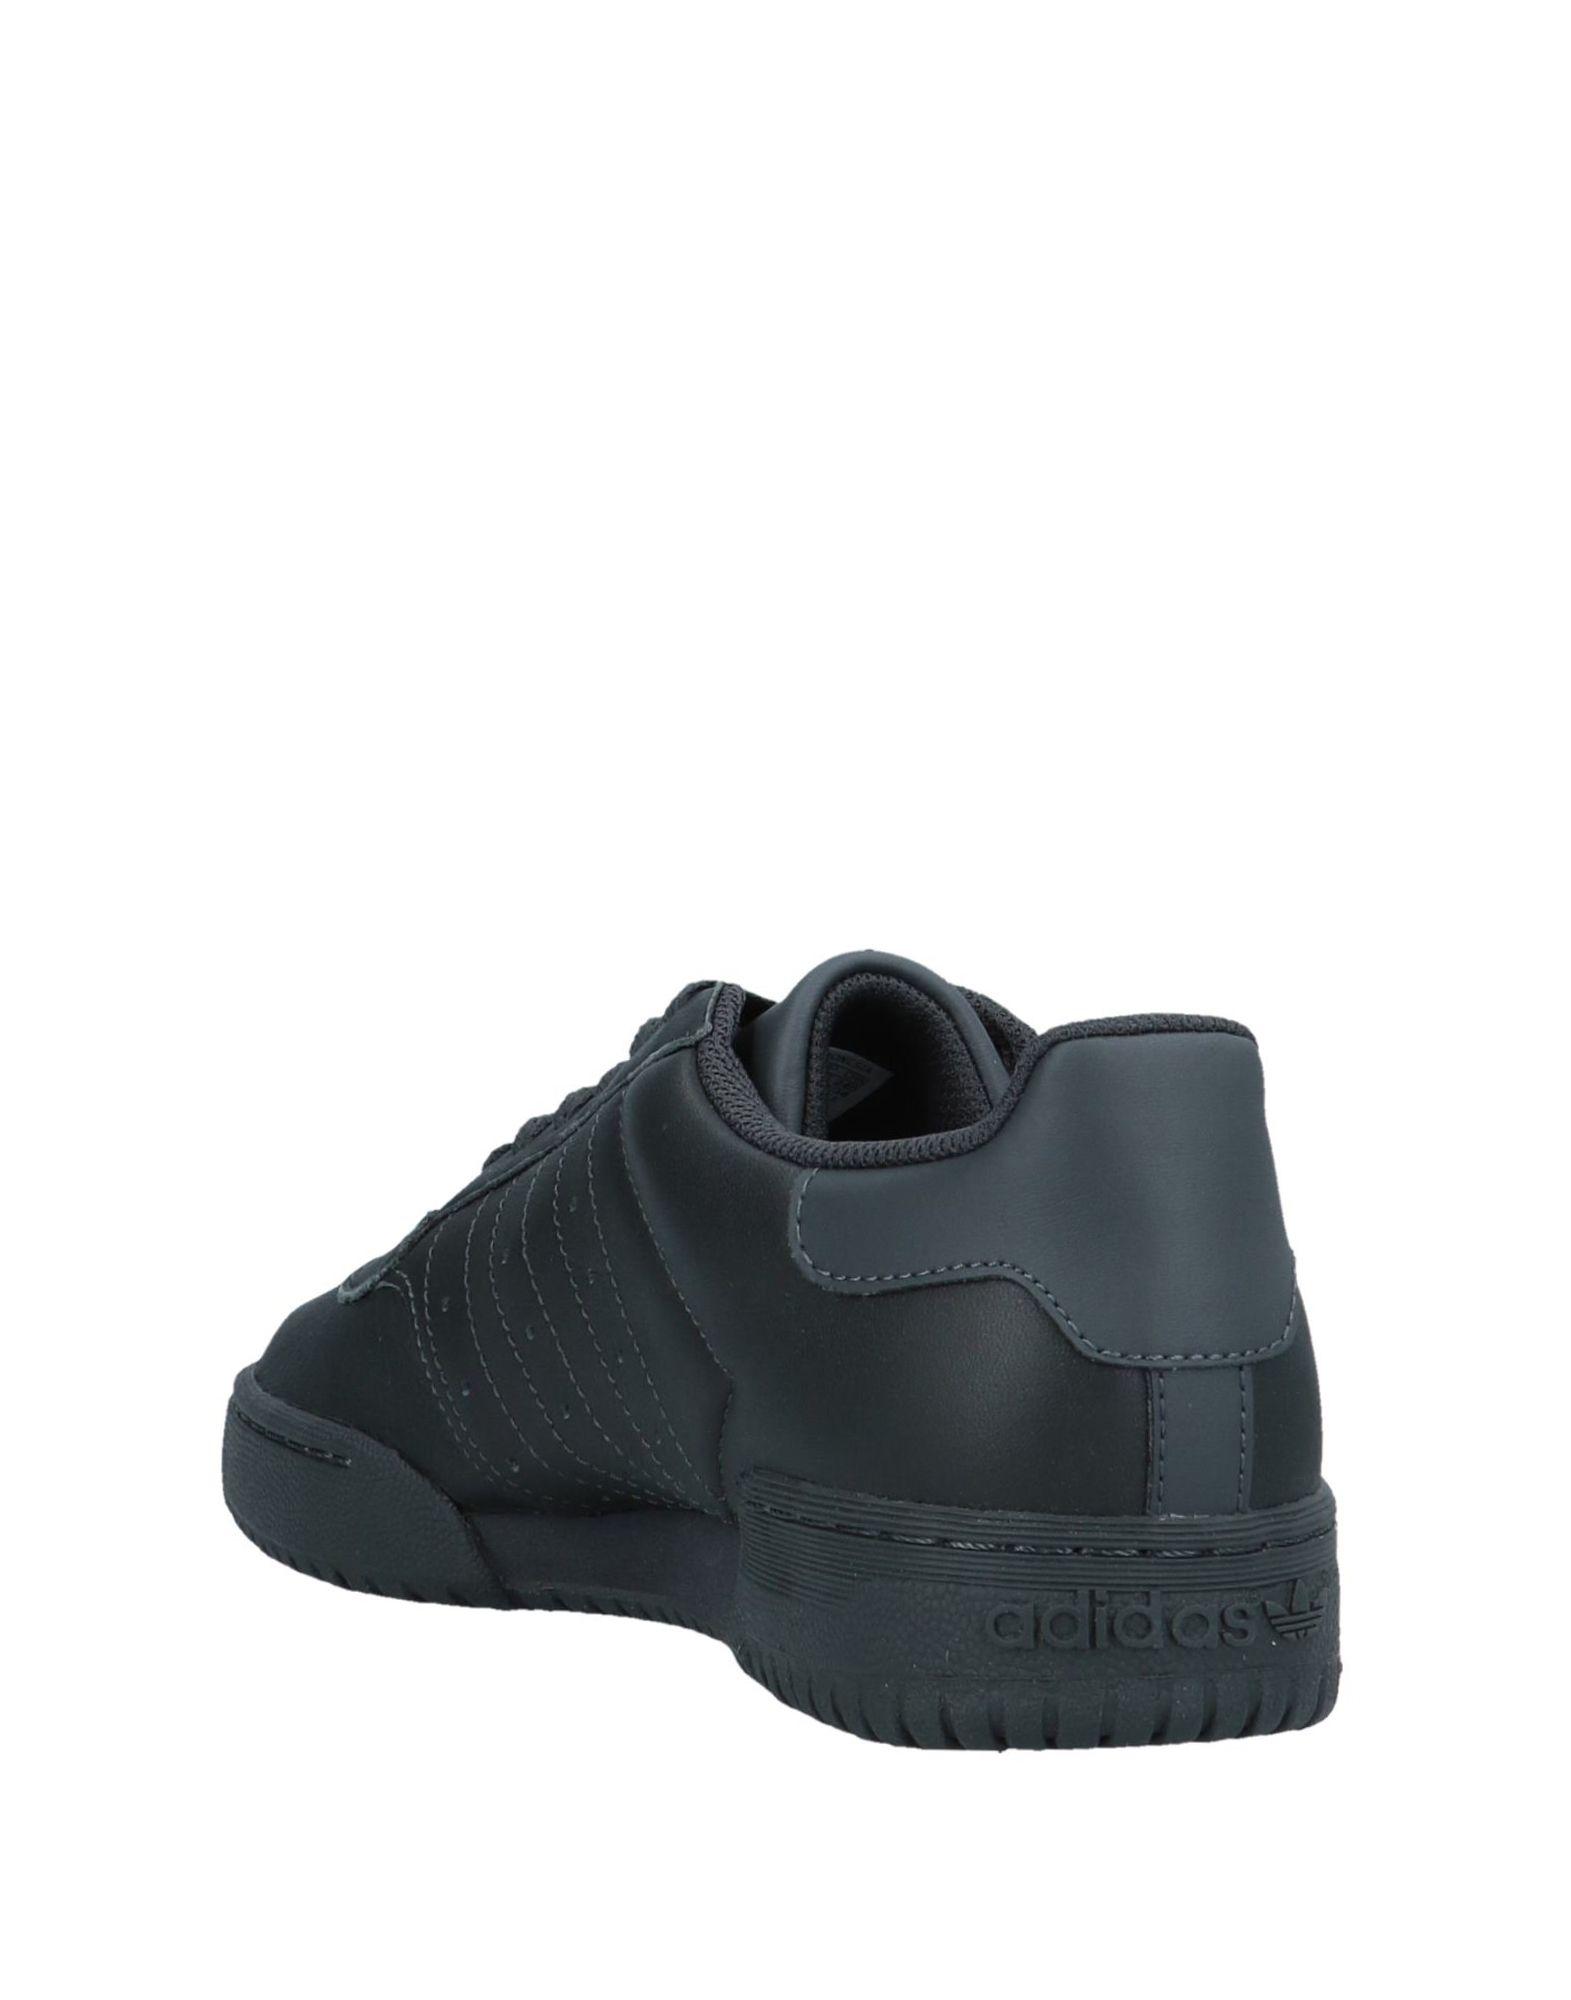 Adidas Originals Sneakers - Men Adidas Originals Sneakers online 11587209DJ on  Australia - 11587209DJ online 7beab9